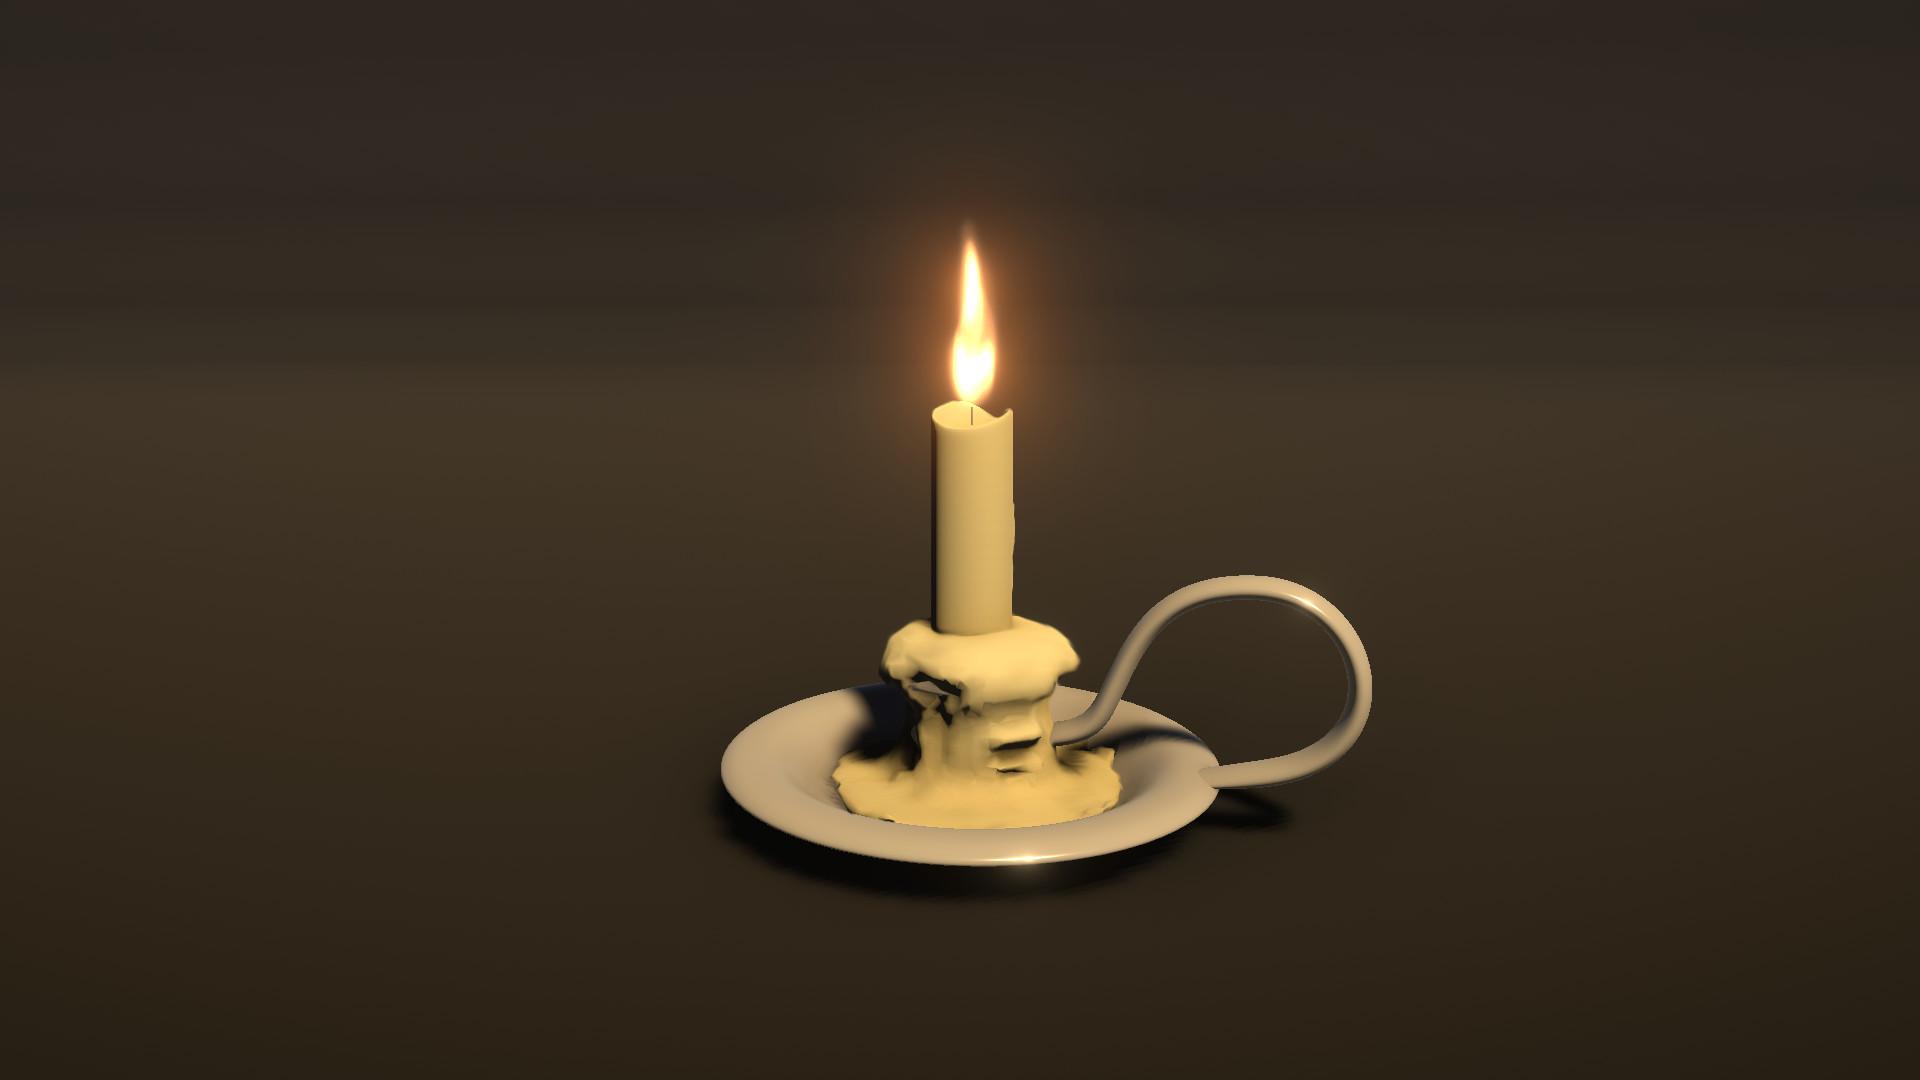 ArtStation - Unity Shader Graph - Fire Flames Shader, Gabriel Aguiar